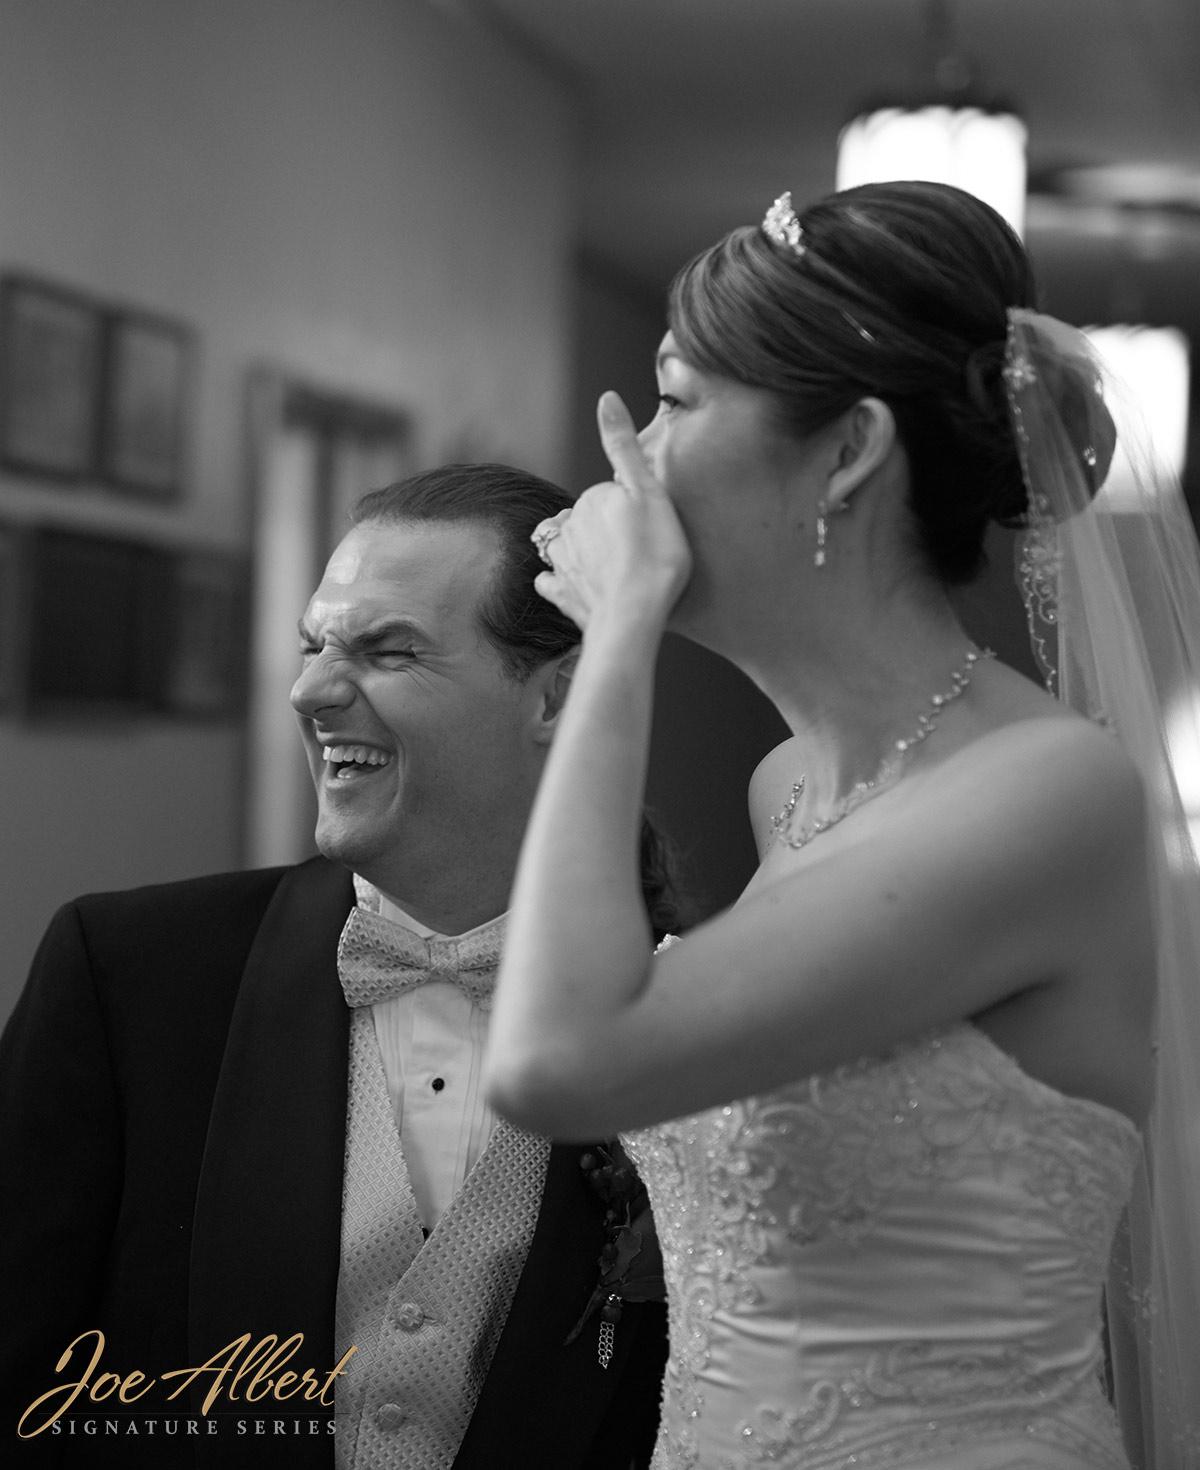 Just love this shot of Kathy Vogel and Joe Vitale